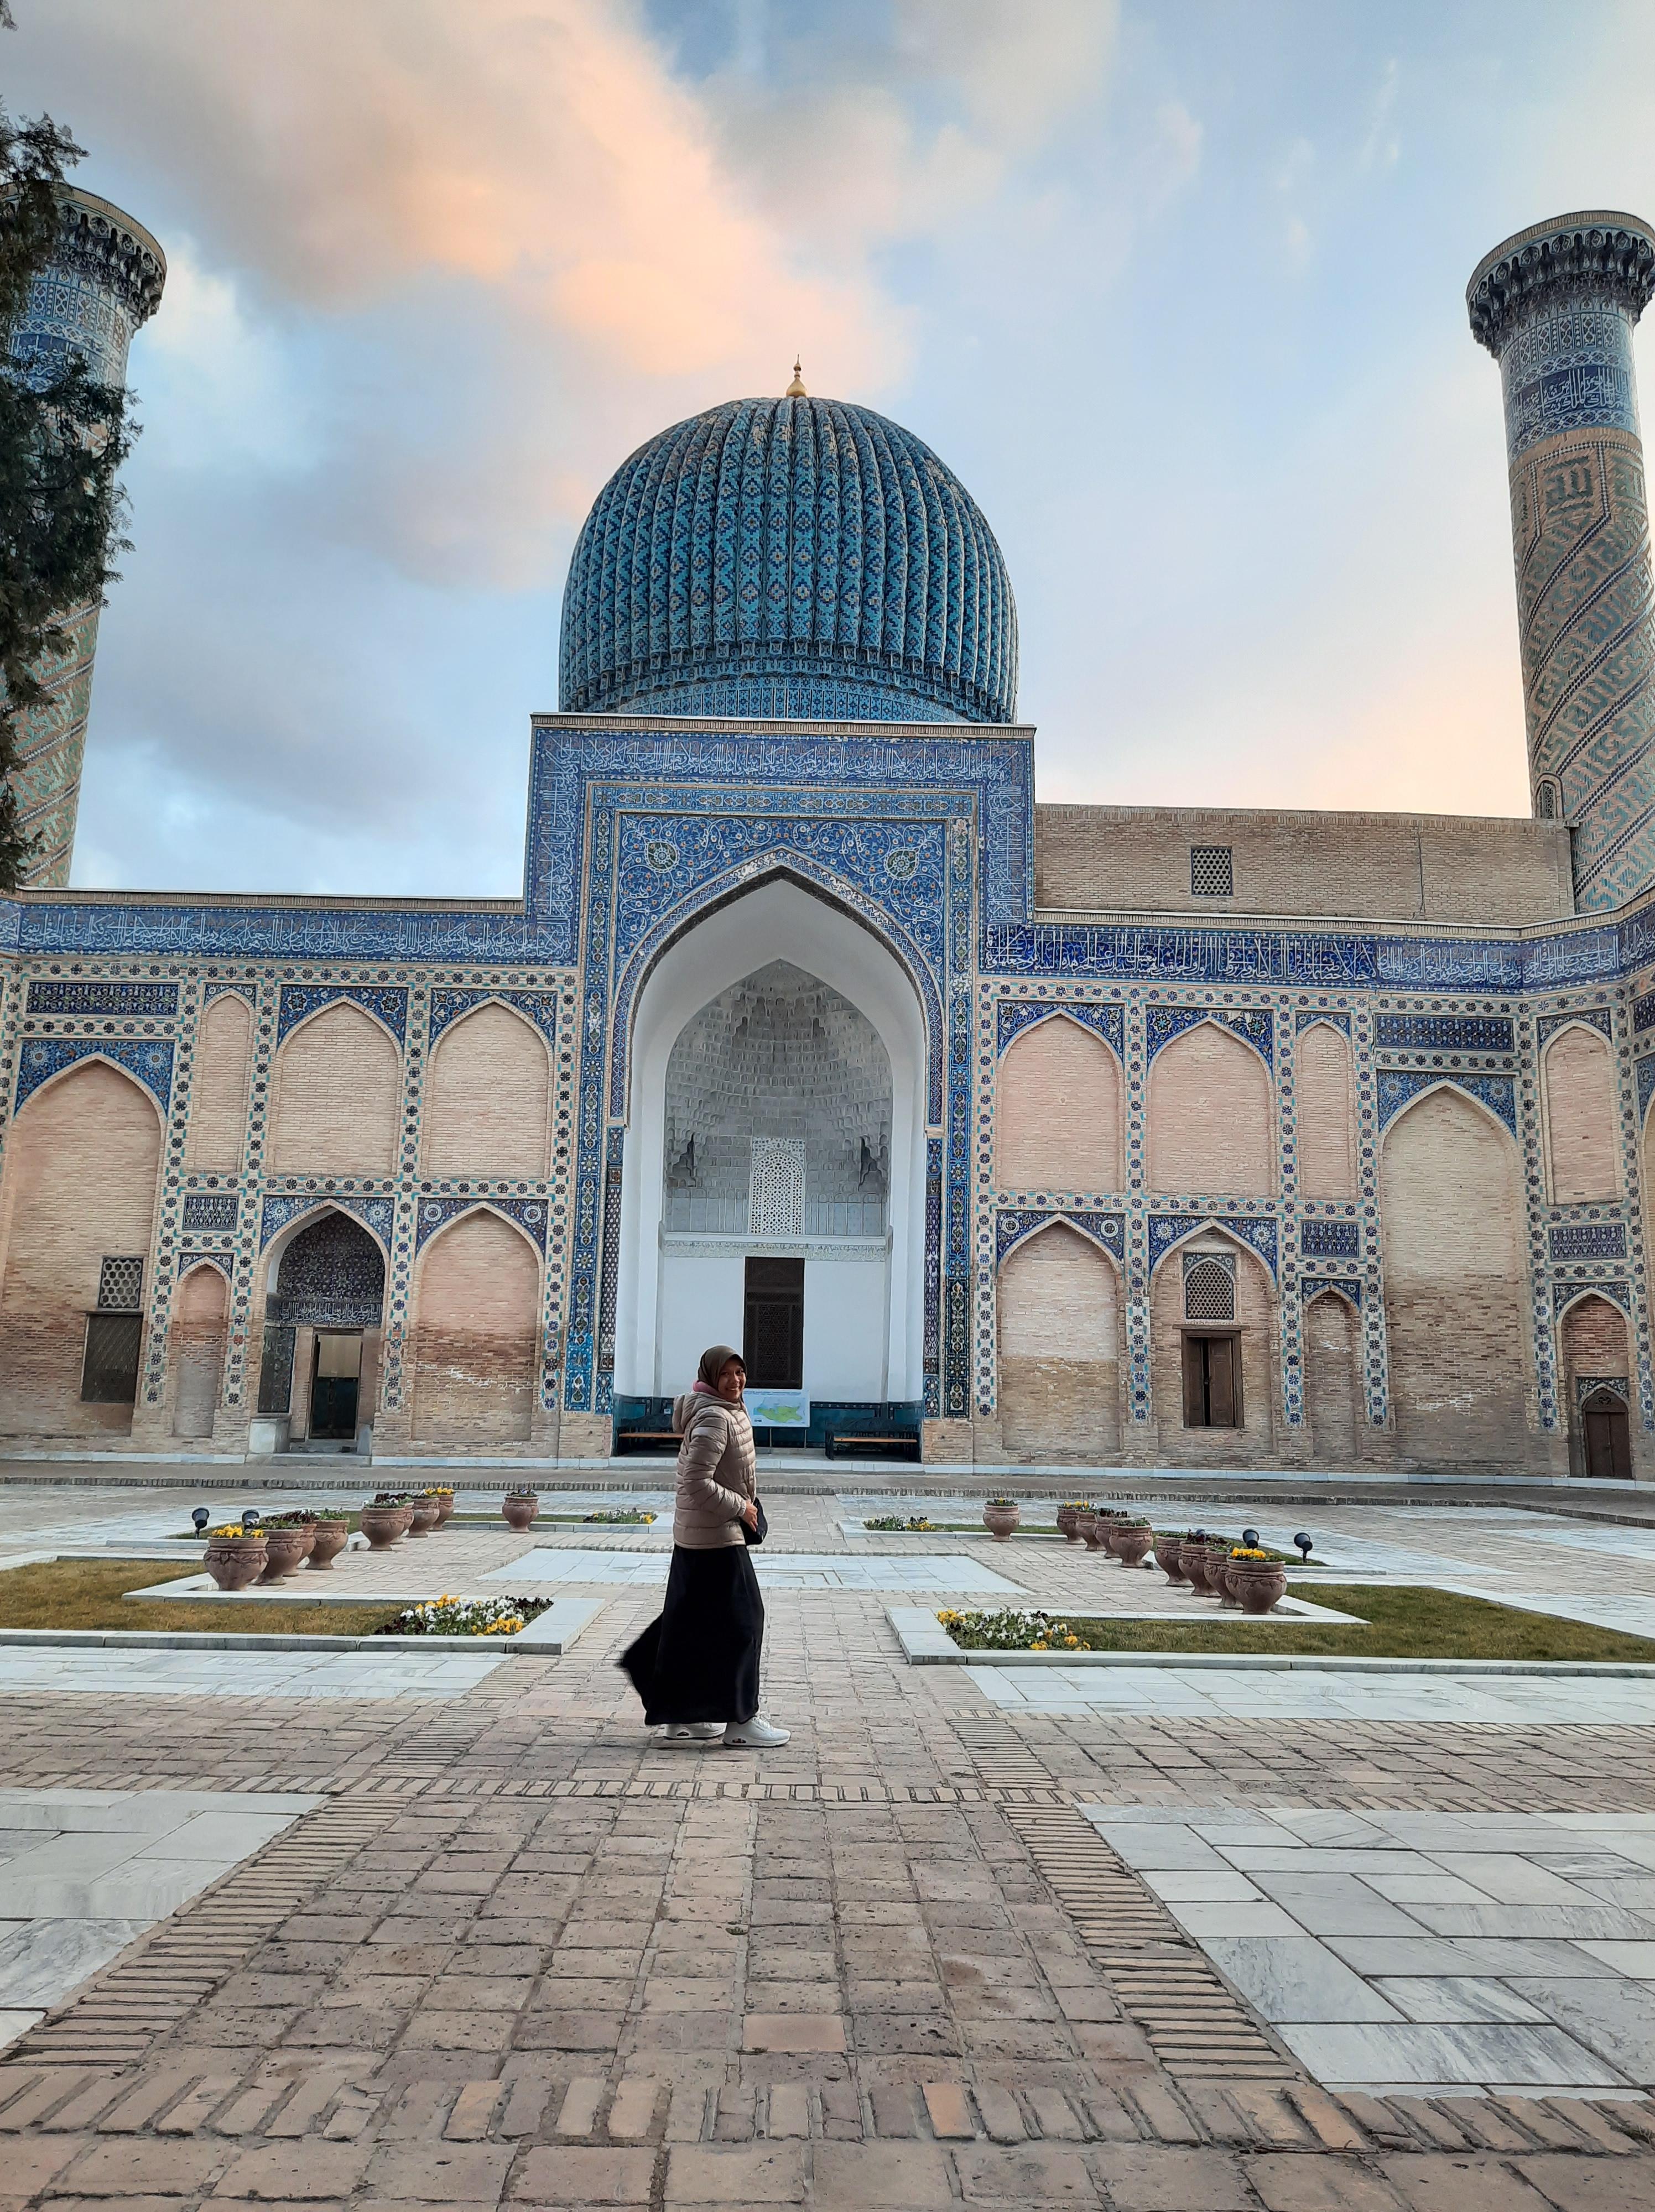 Samarkhan, Uzbekistan